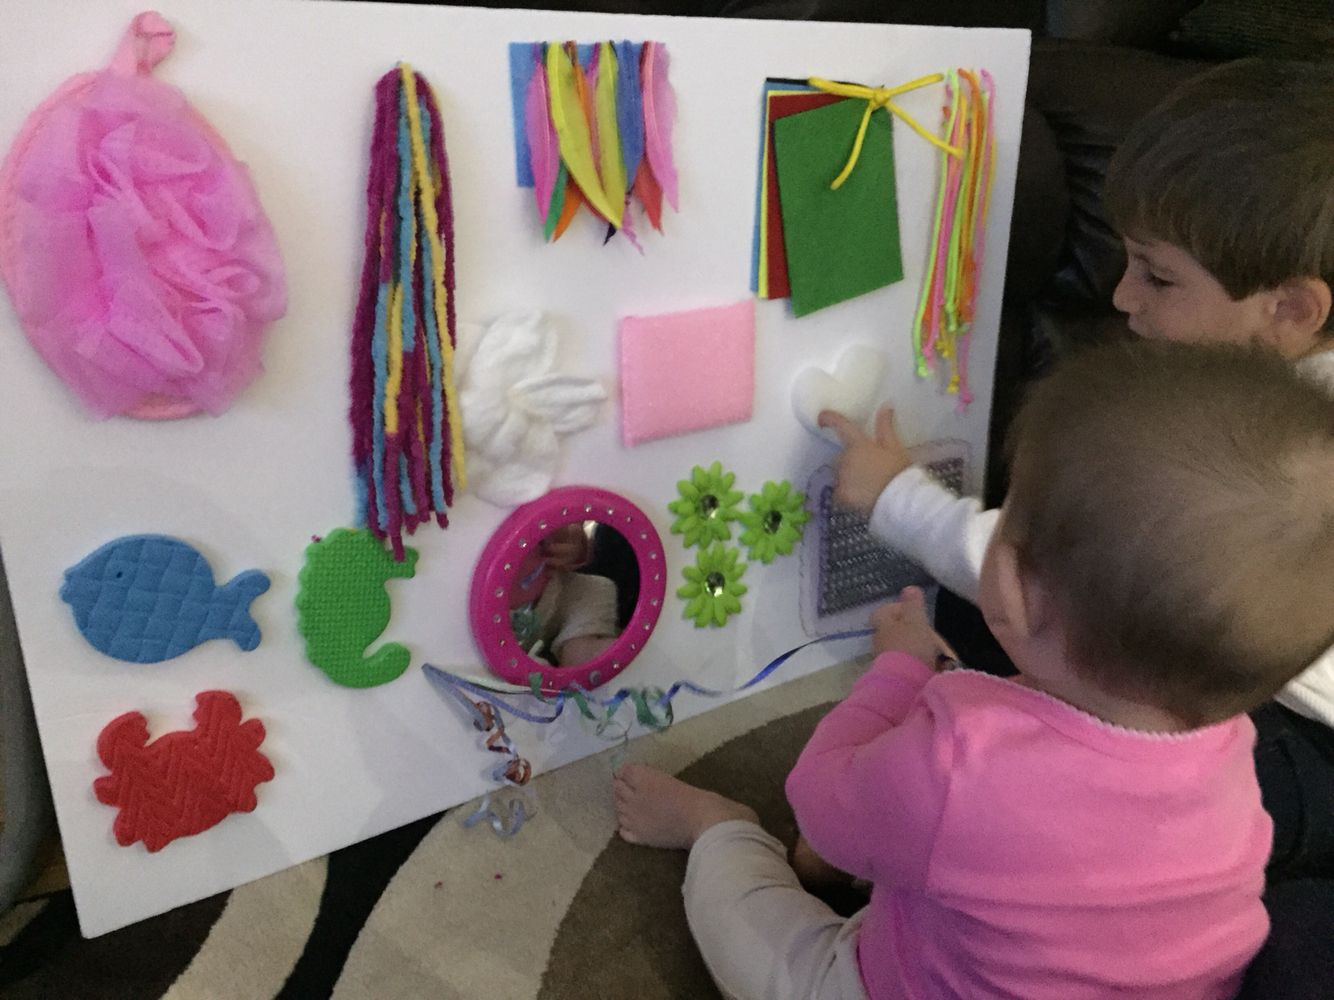 Sensory Board DIY 6 Month Old Baby